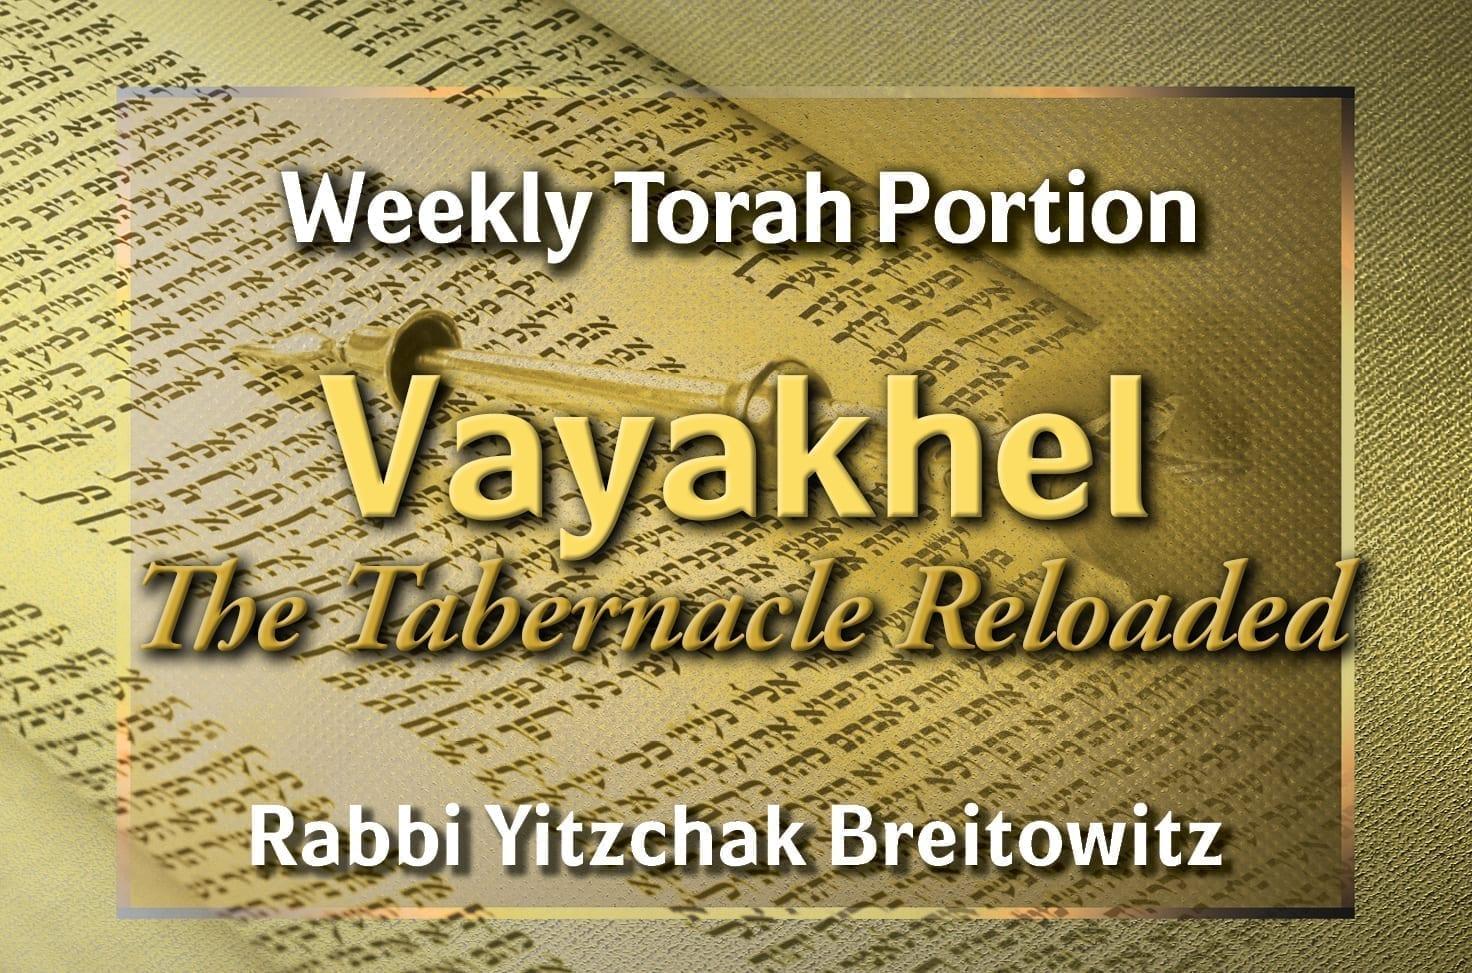 Photo of Parshat Vayakhel – The Tabernacle Reloaded